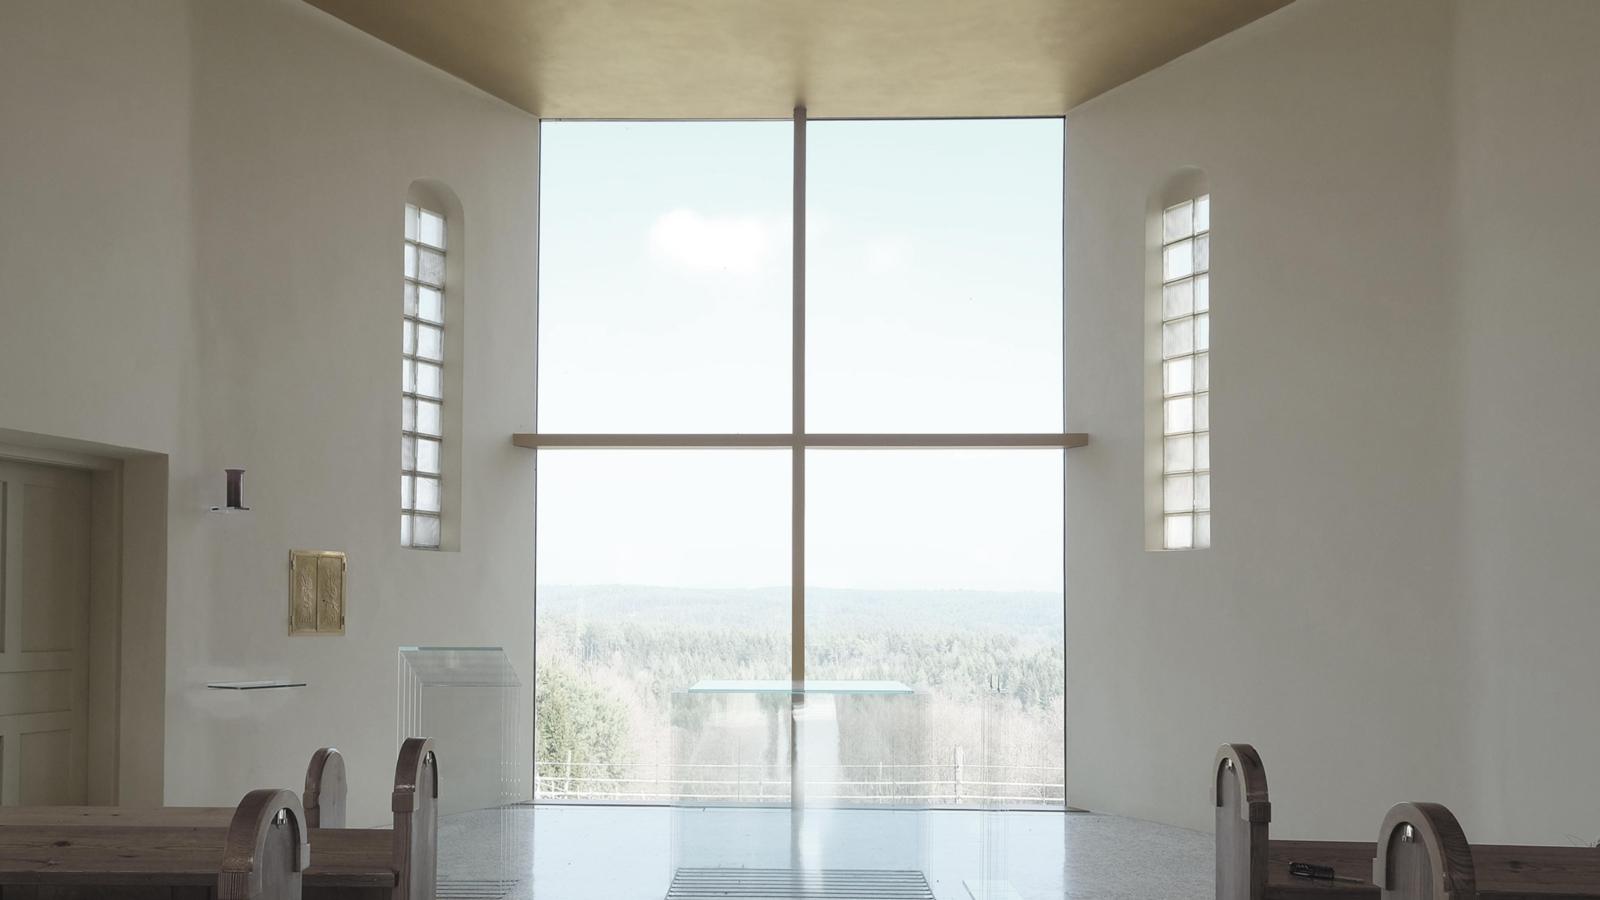 Filialkirche Neuhaus Innenraumfoto01